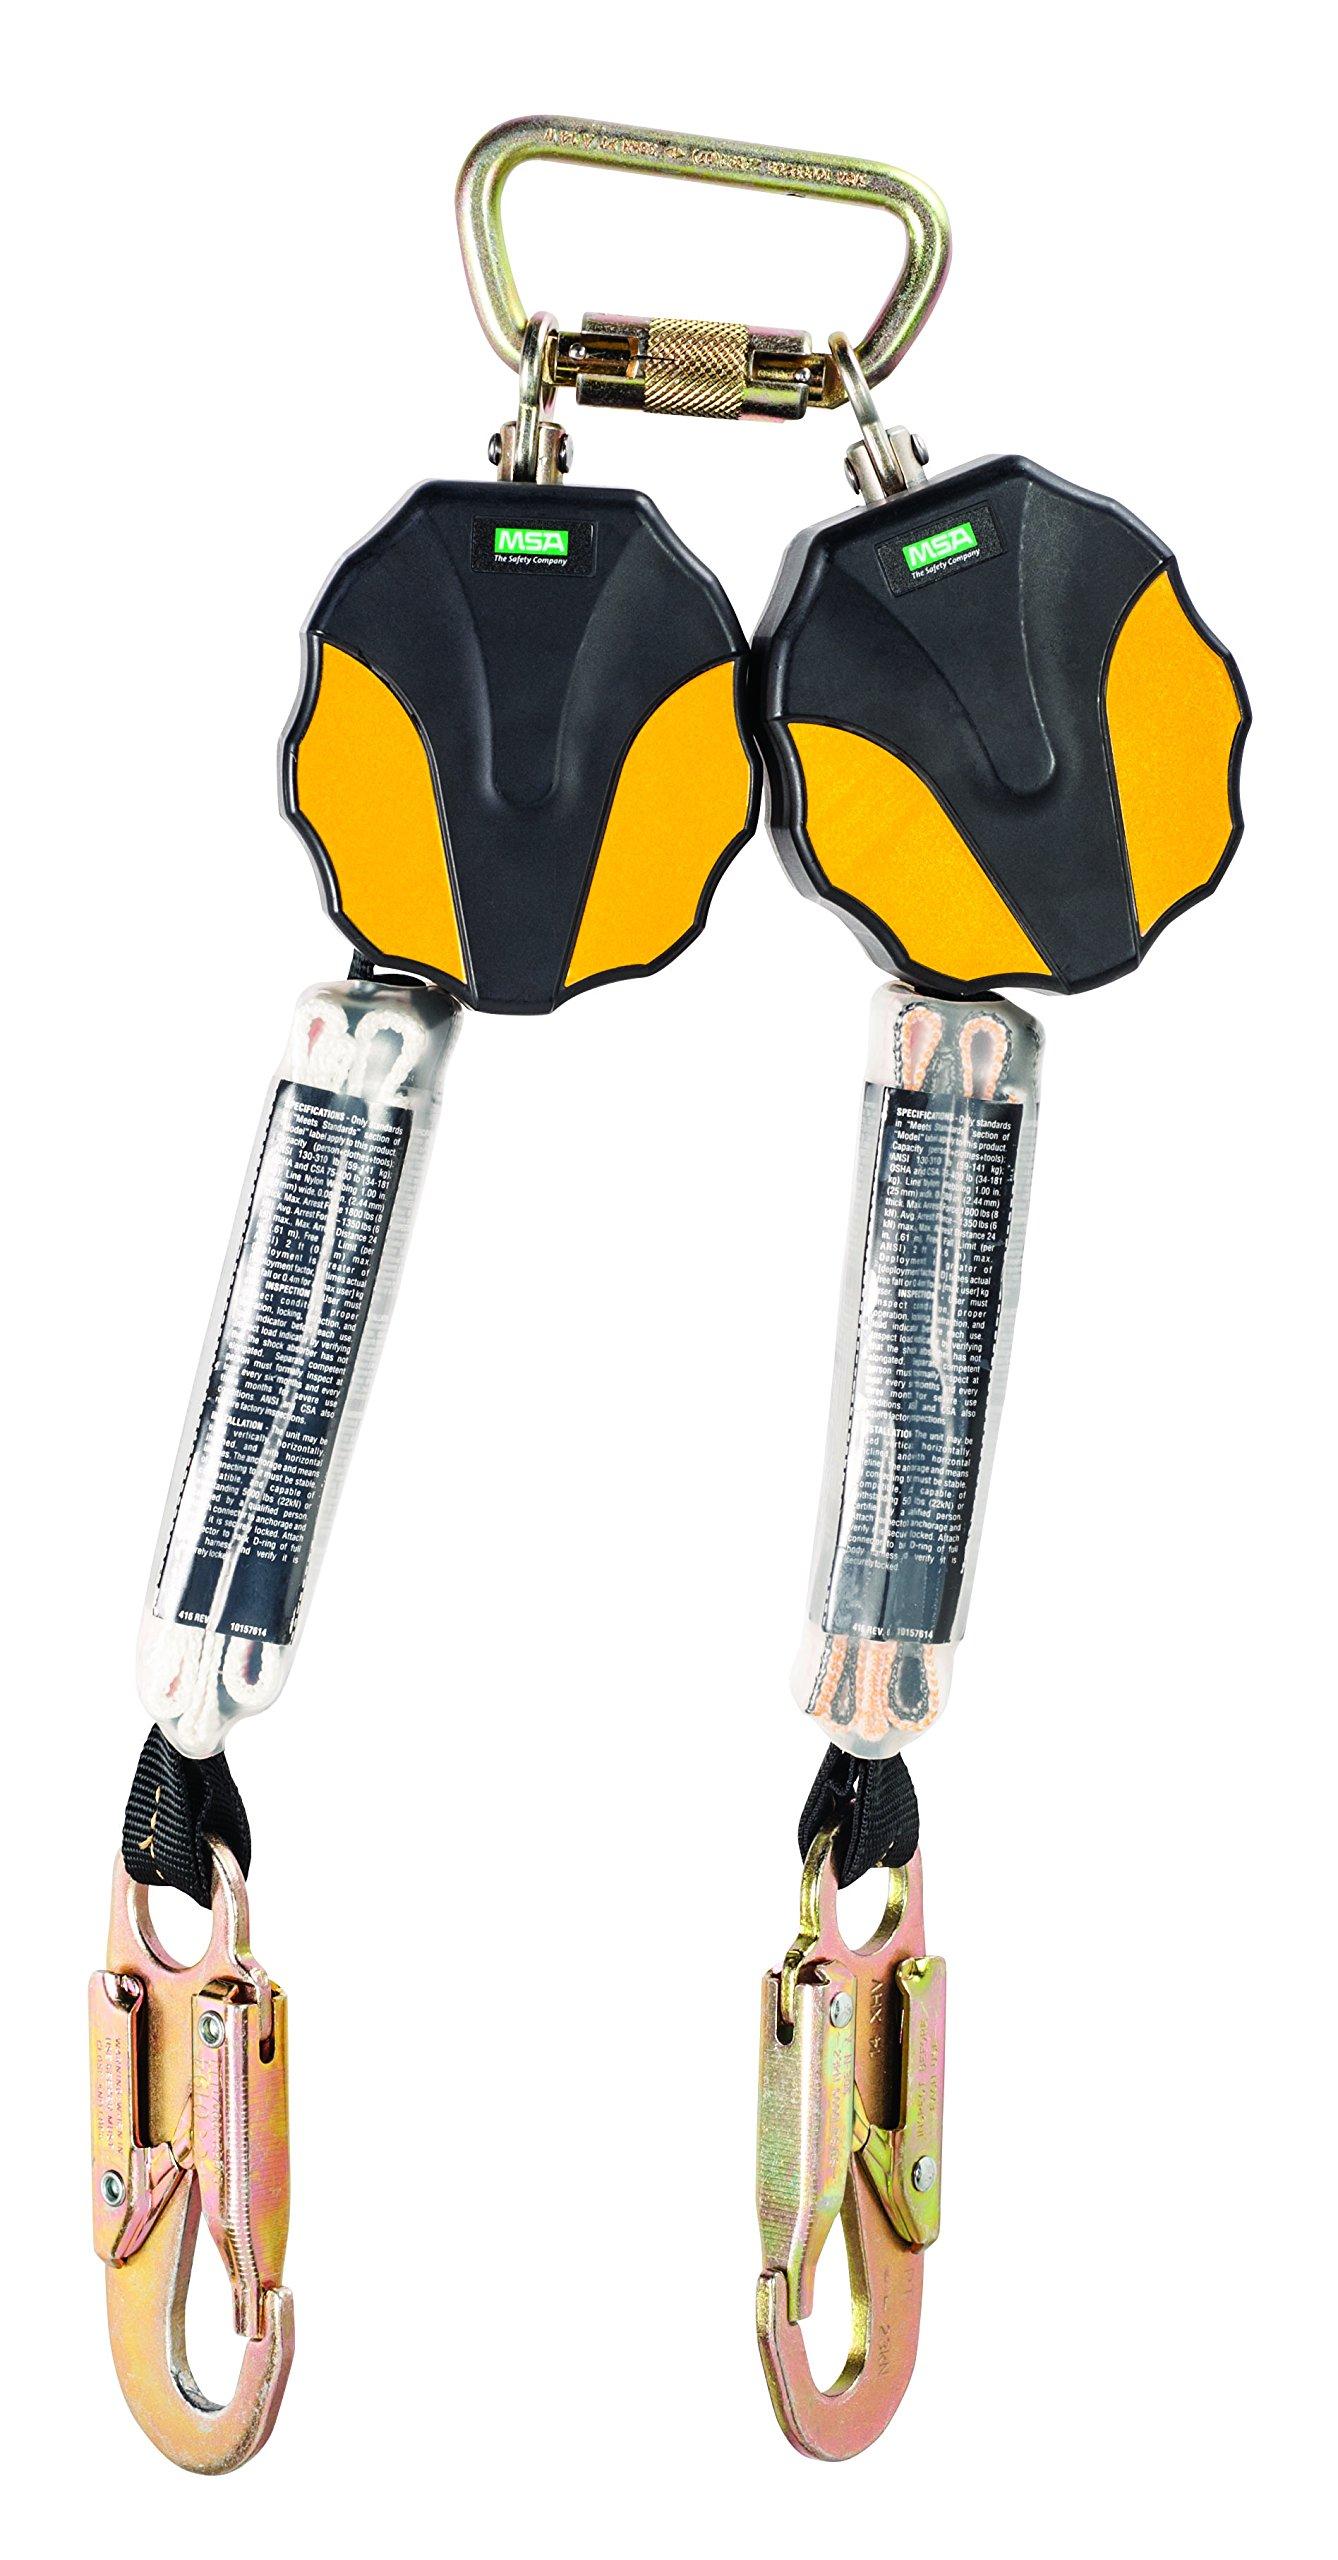 MSA 10157858 Workman Mini Twin-Leg ANSI-Certified Personal Fall Limiter with 36C Snap Hook, 6-Feet